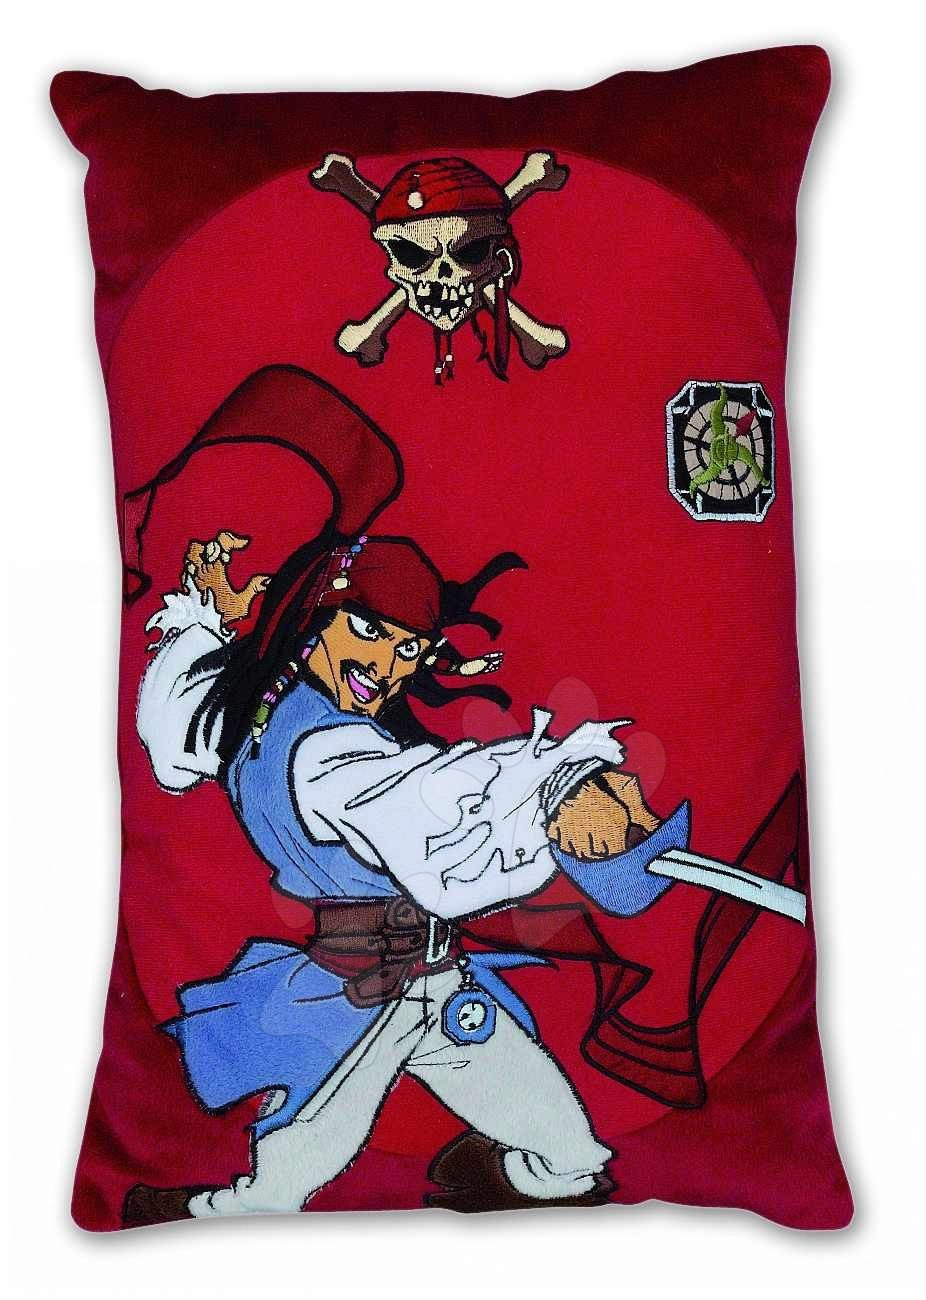 Vankúšik Piráti z Kabiriku Ilanit červený